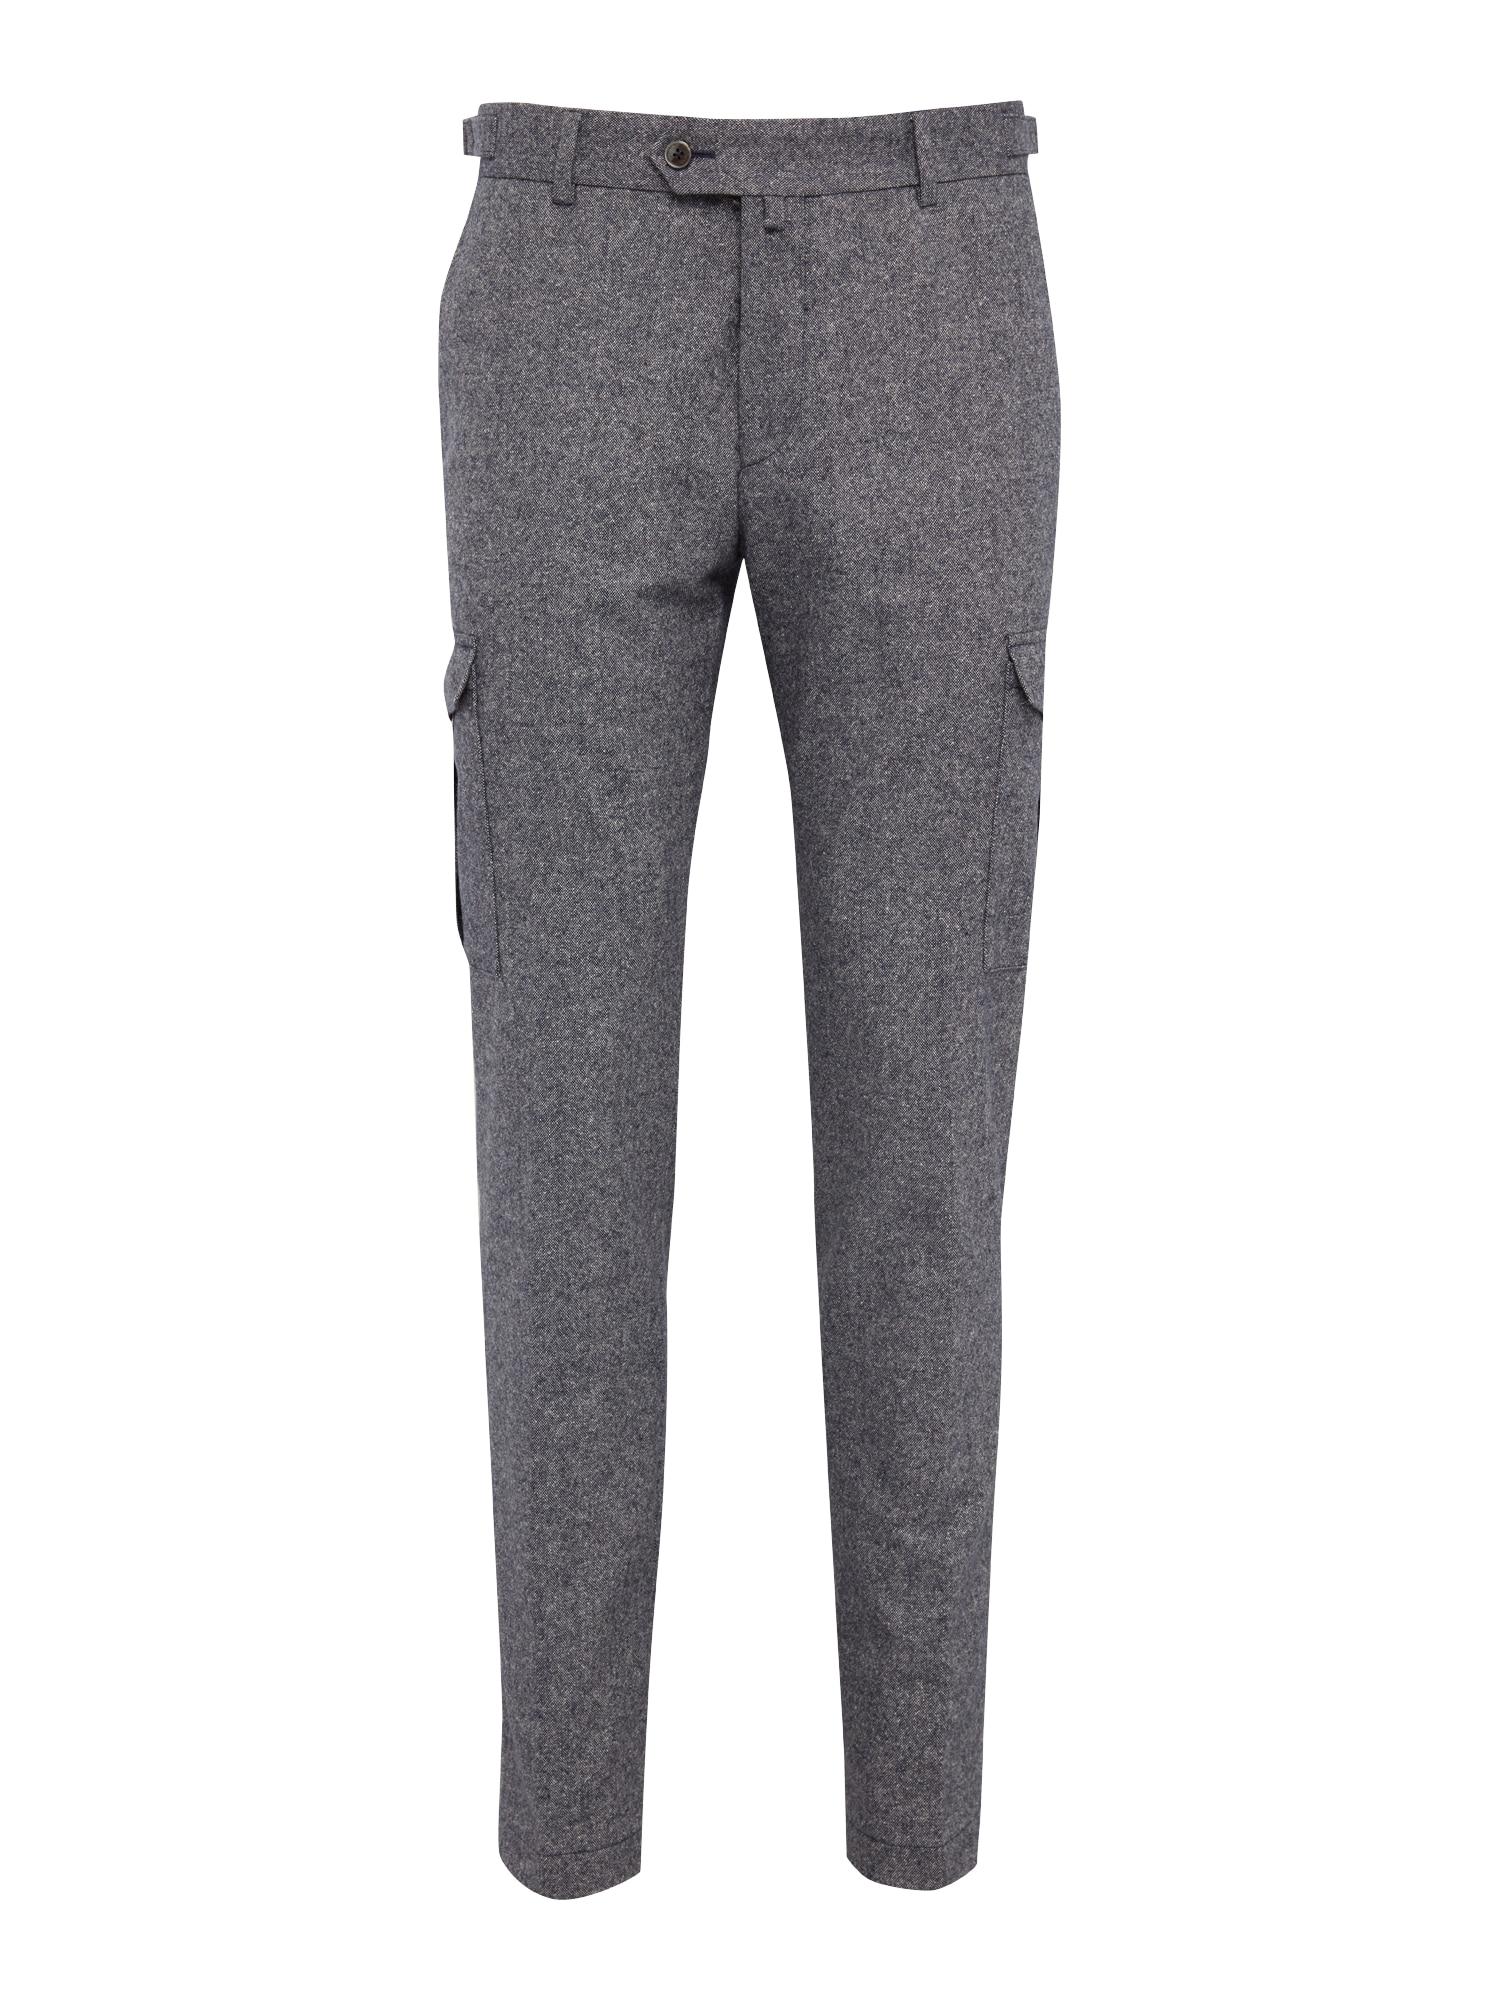 Chino kalhoty 17 JT-26Hudzon 10003892 tmavě šedá JOOP!